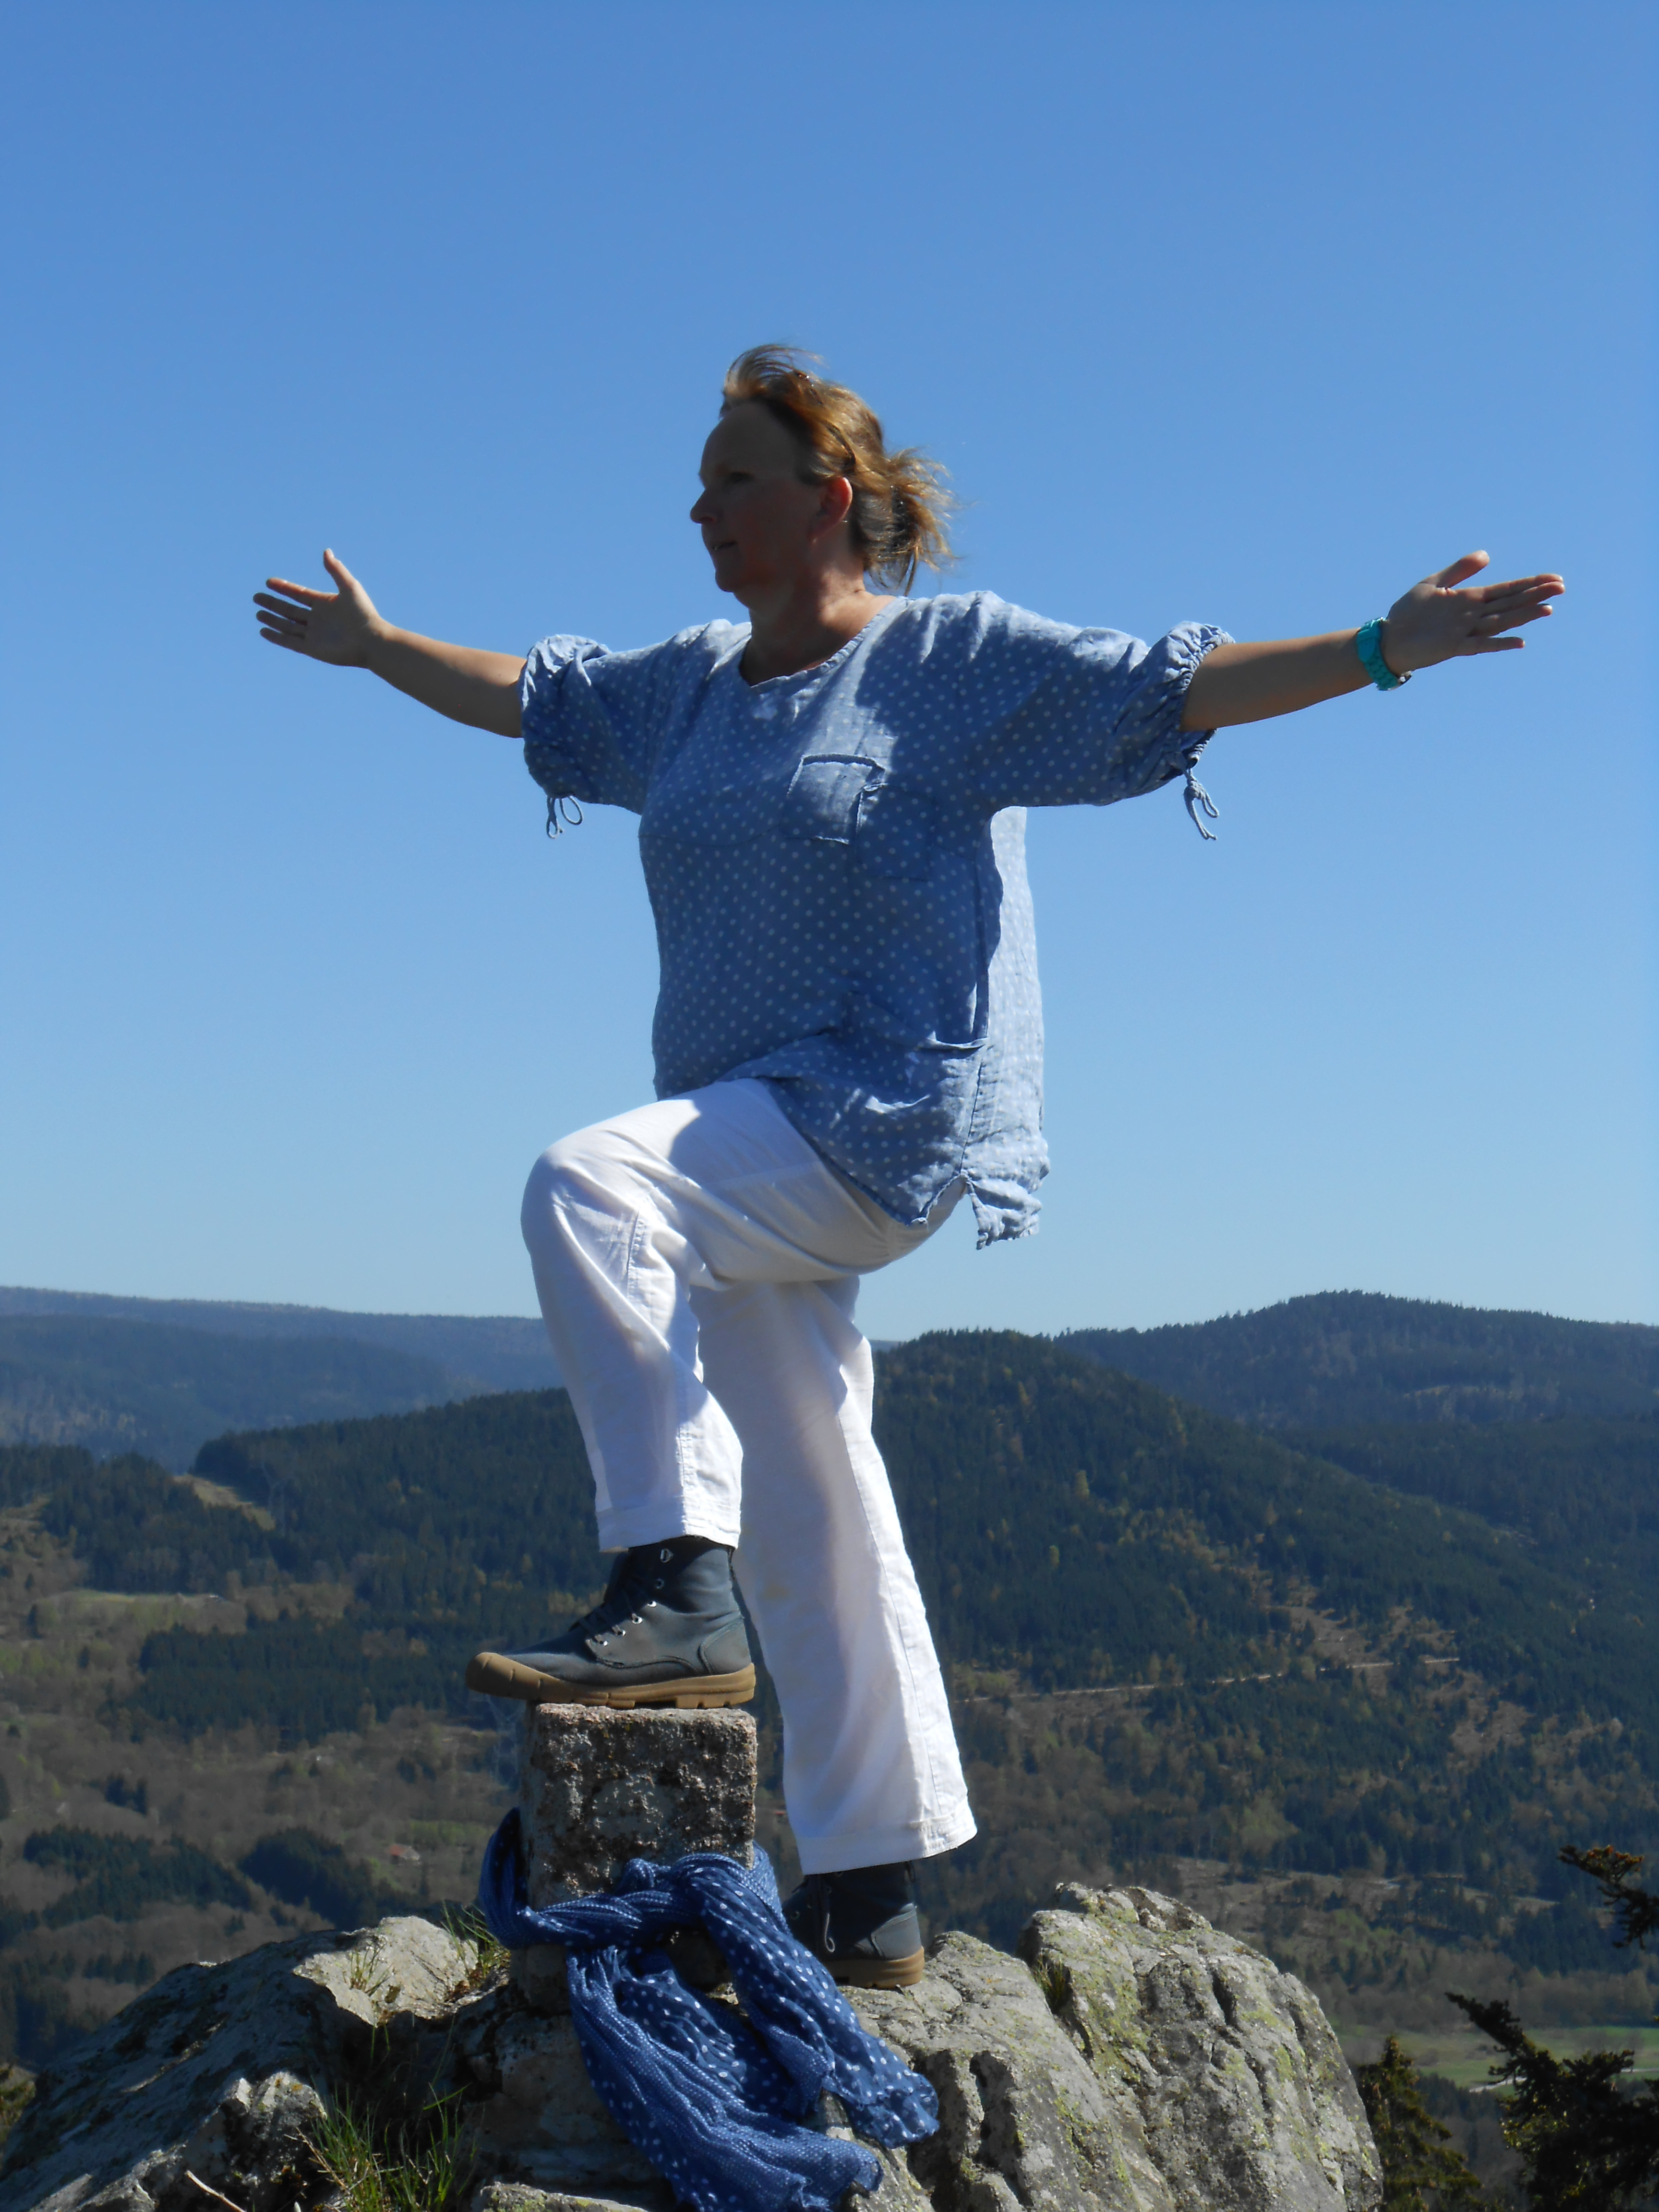 Matty op de bergtop, Casa Boslimpre